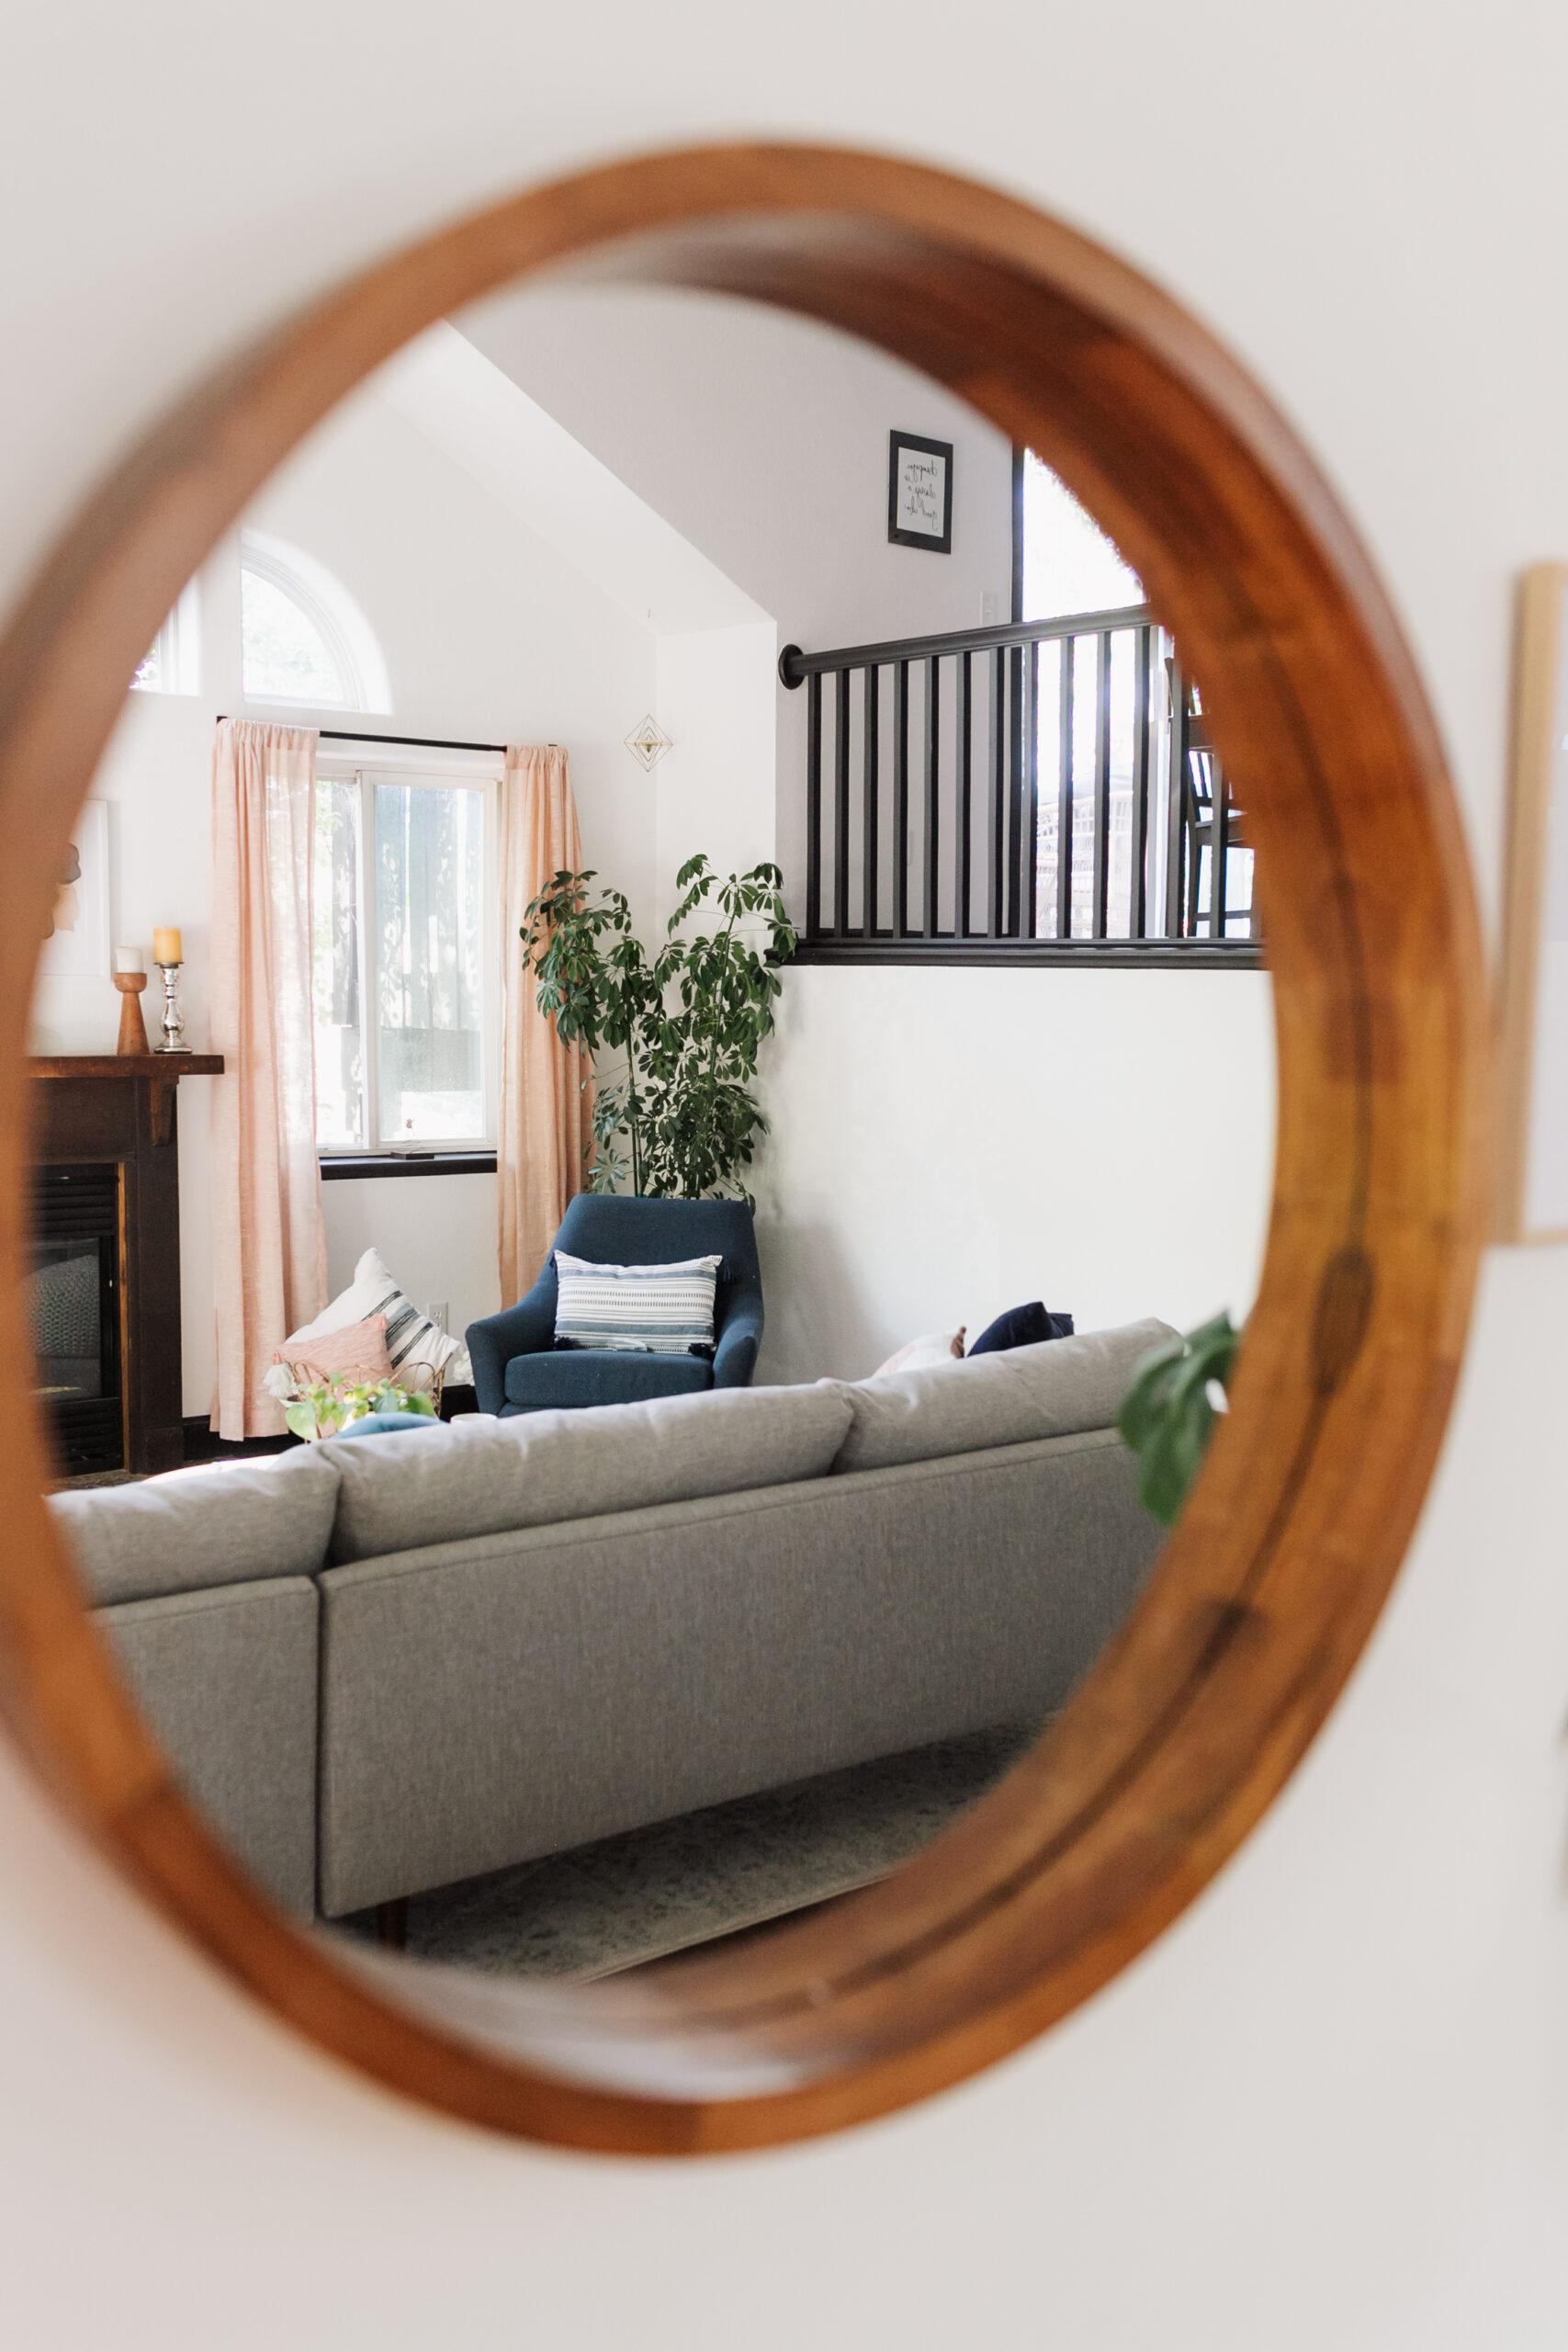 a sneak peek into the modern mountain living room reveal #theldlhome #modernmountainhome #mcm #theldlhome #livingroom